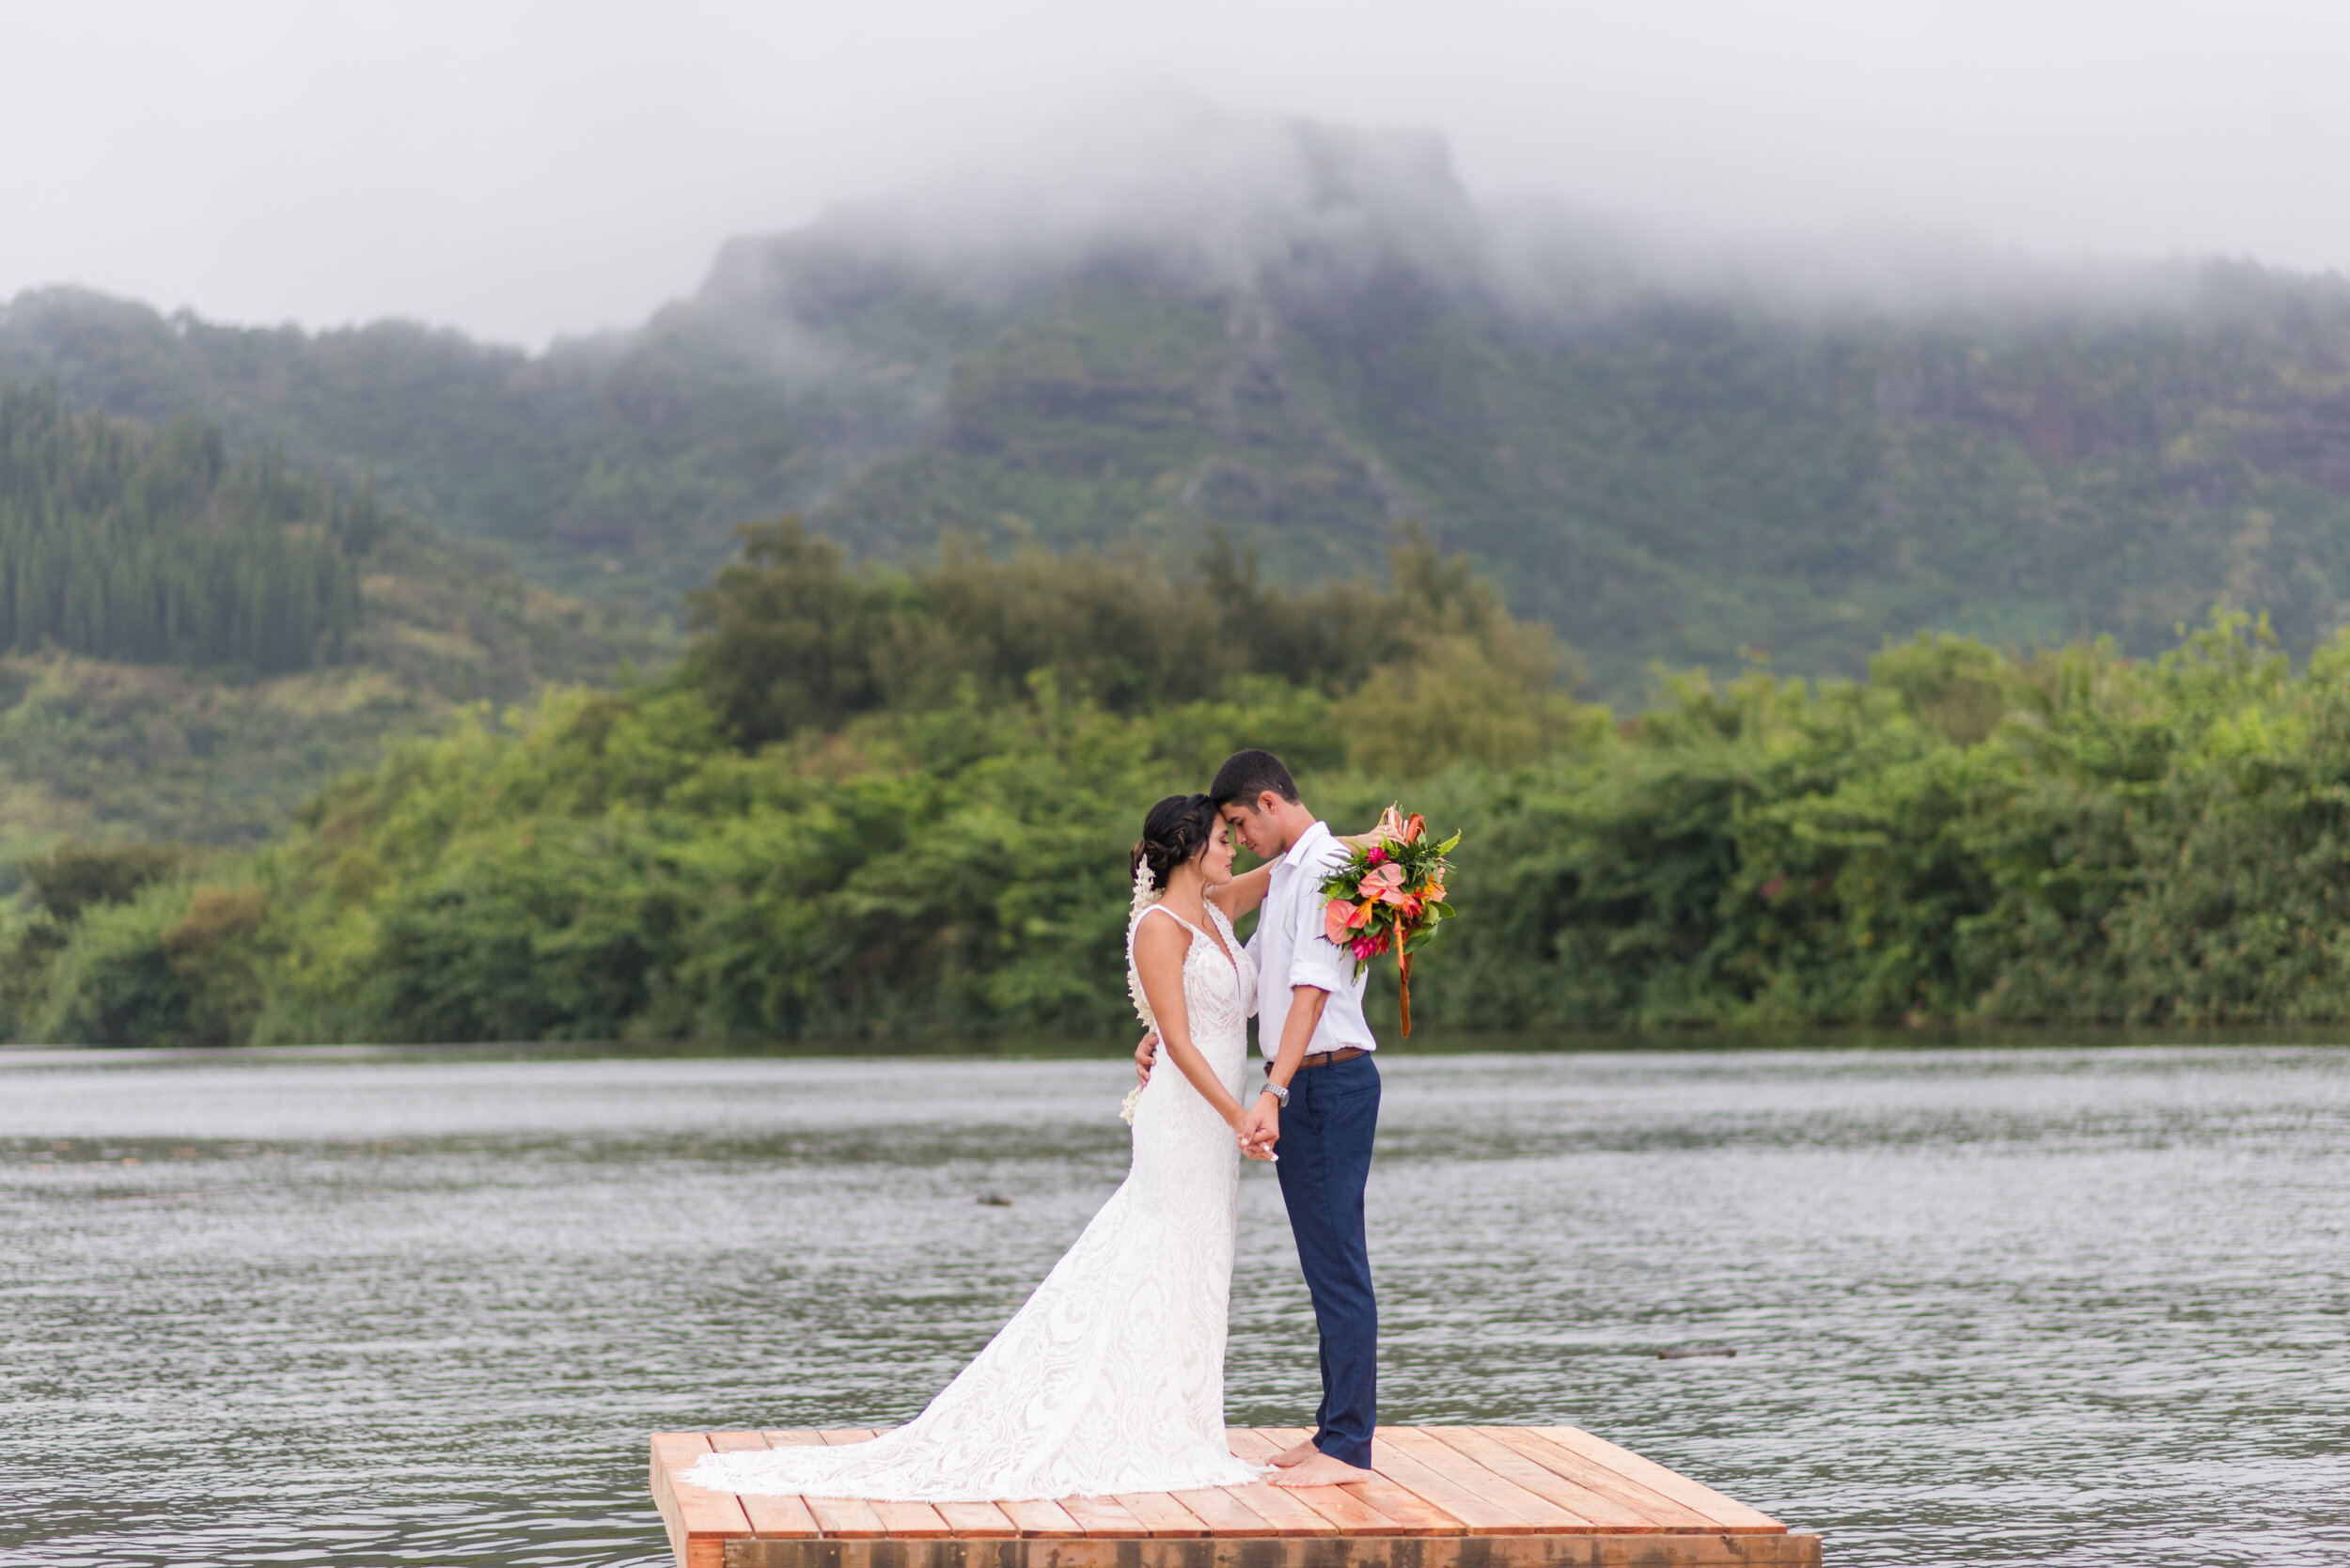 Destination Wedding Hawaii Wailua River Kauai Floating Dock Couple Photo Just Married Sleeping Giant